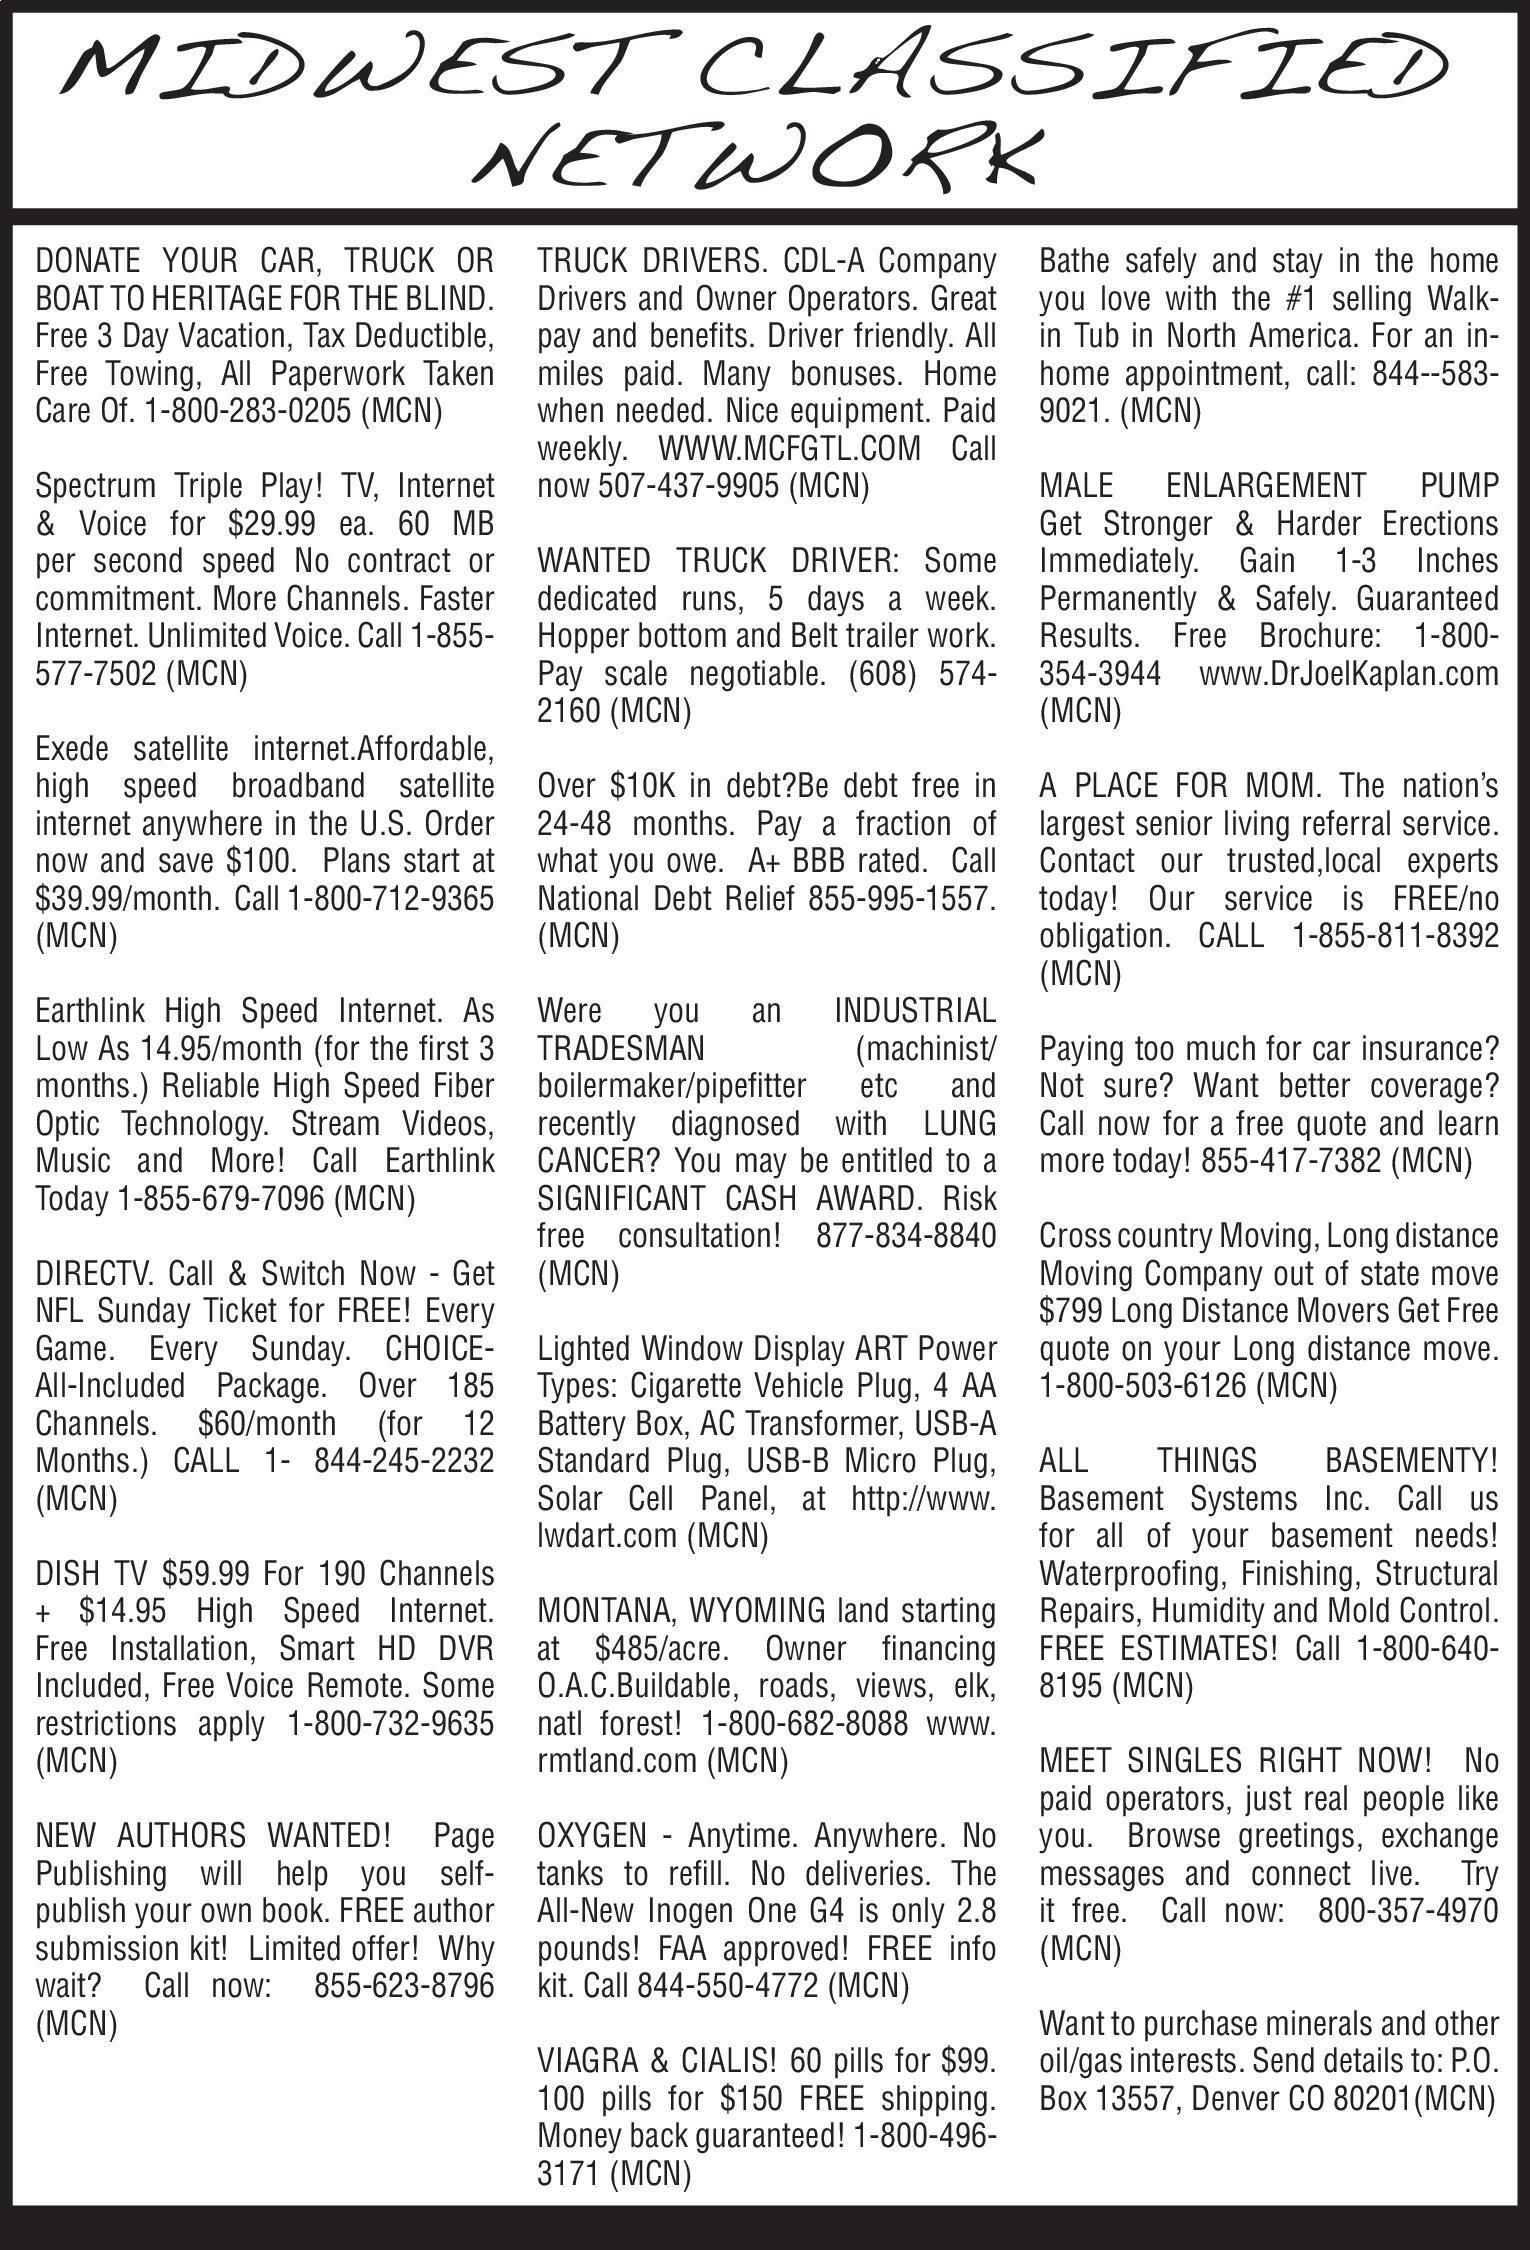 Mankato Home Magazine | Newspaper Ads | Classifieds